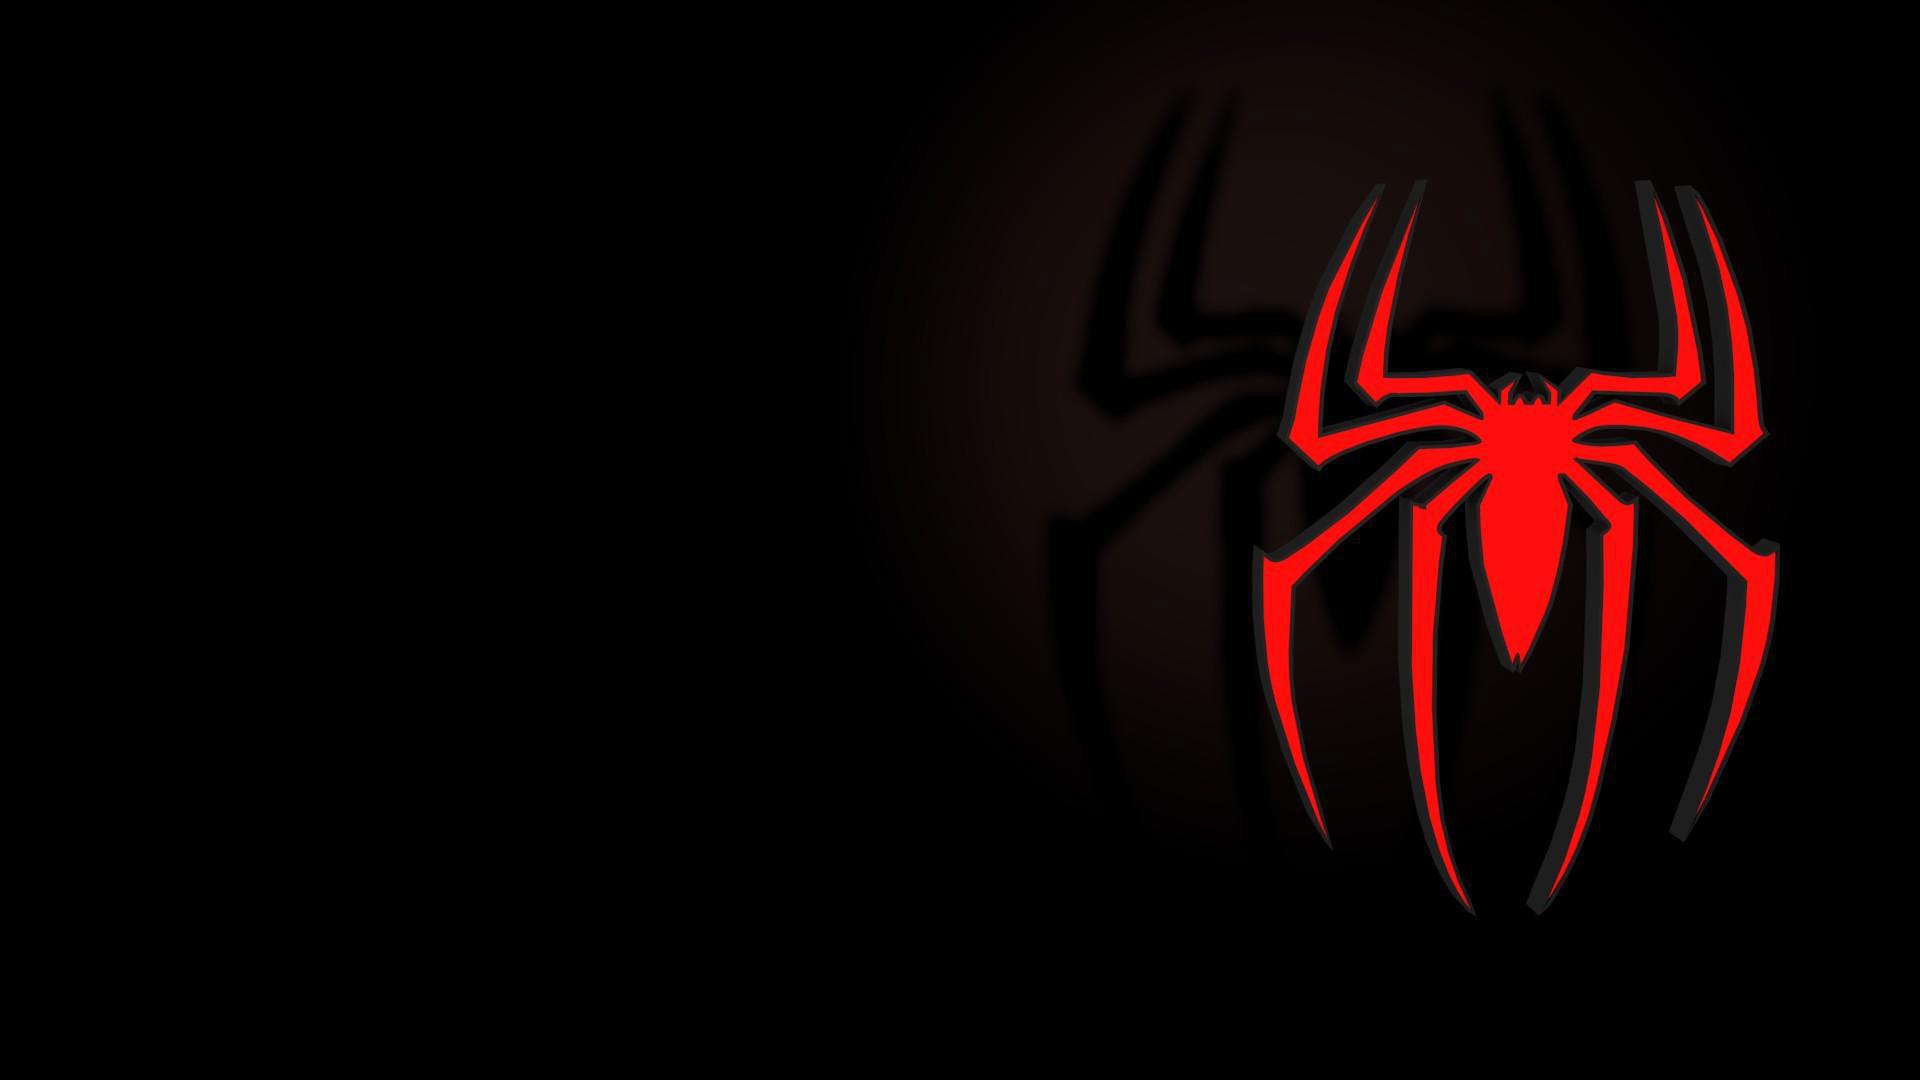 Skyrim Iphone X Wallpaper Spiderman Logo Wallpaper 183 ①